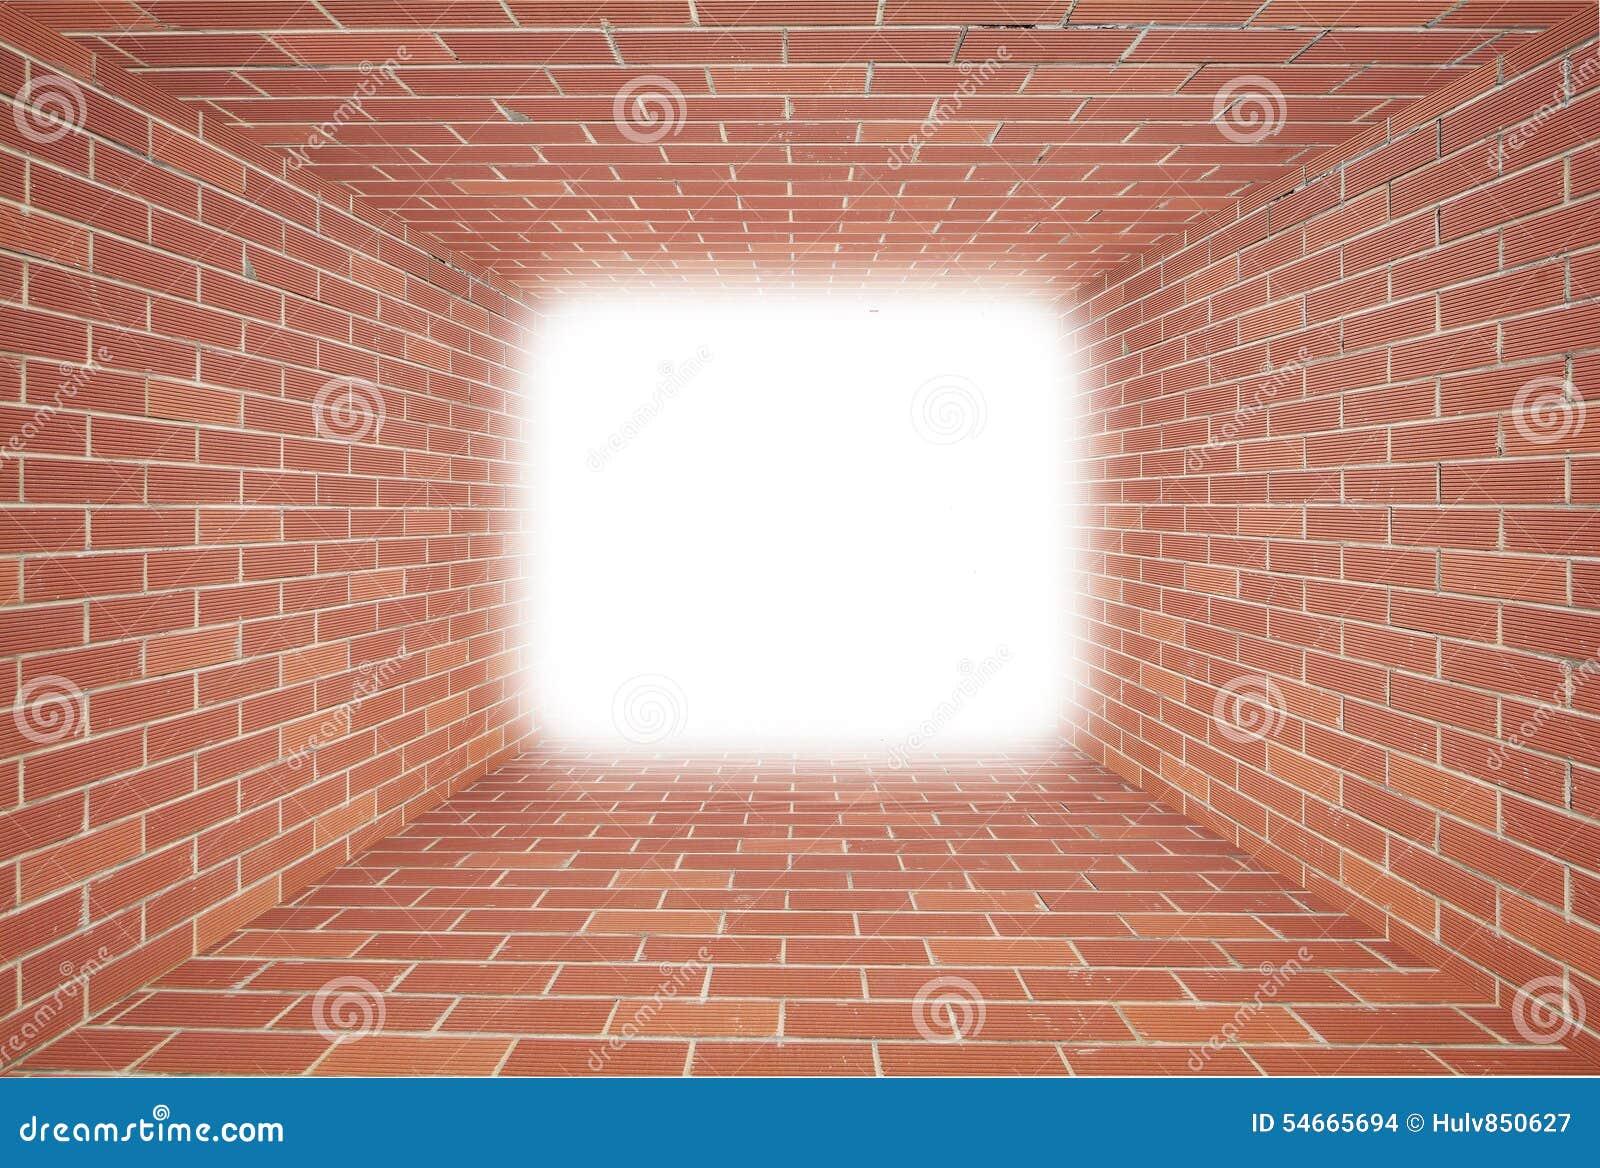 Brick Tunnel Inside Royalty Free Stock Image